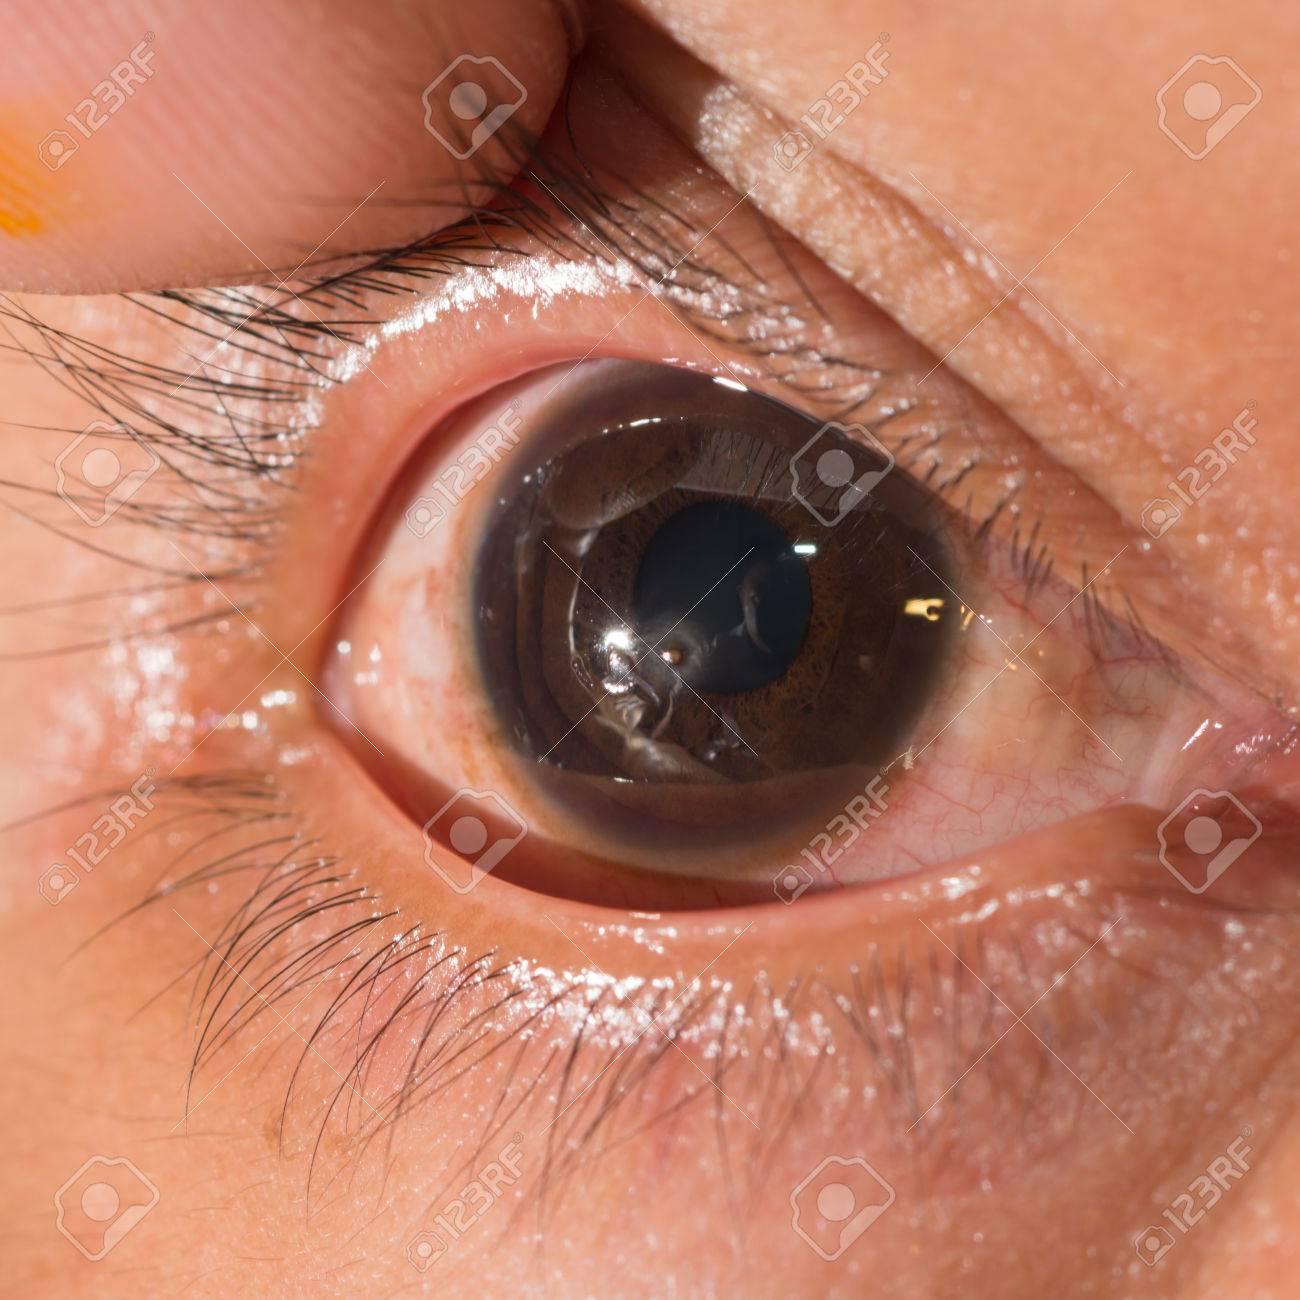 Close up du corps étranger cornéen métallique retenu lors de l'examen de  l'oeil.